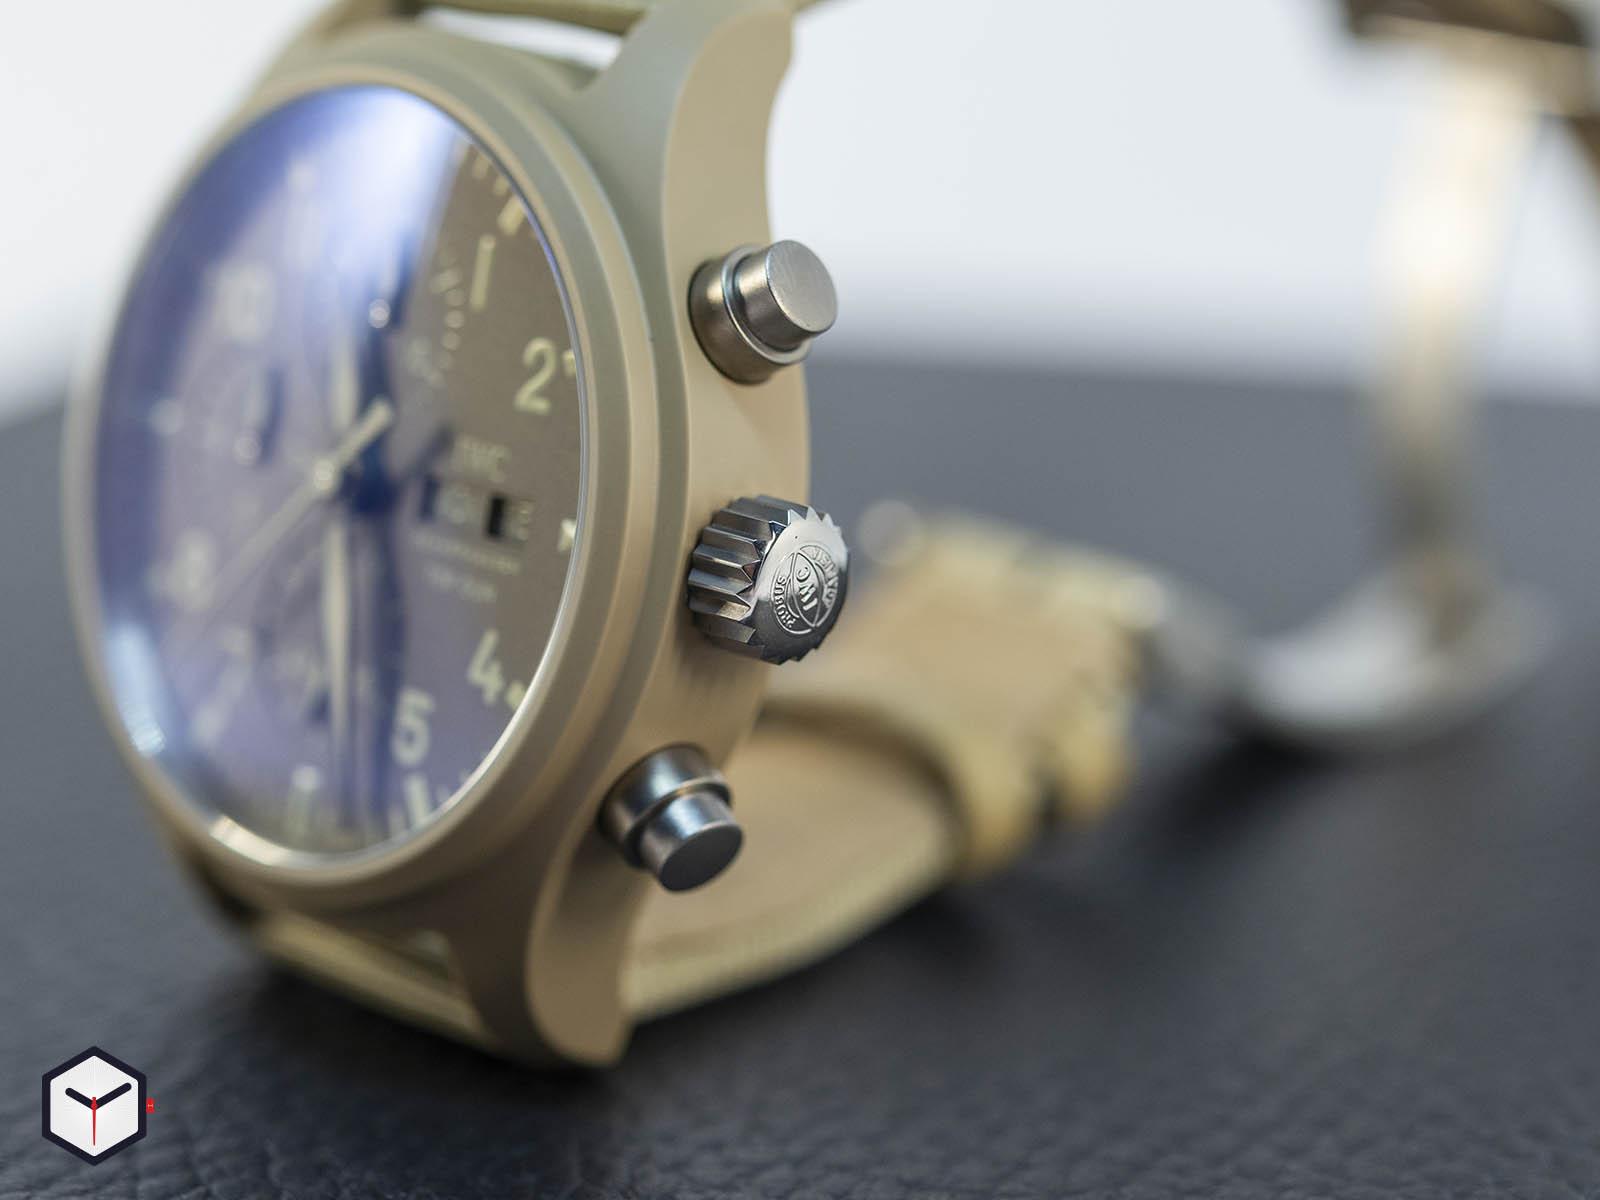 iw389103-iwc-pilot-s-watch-chronograph-top-gun-edition-mojave-desert-sihh-2019-4.jpg